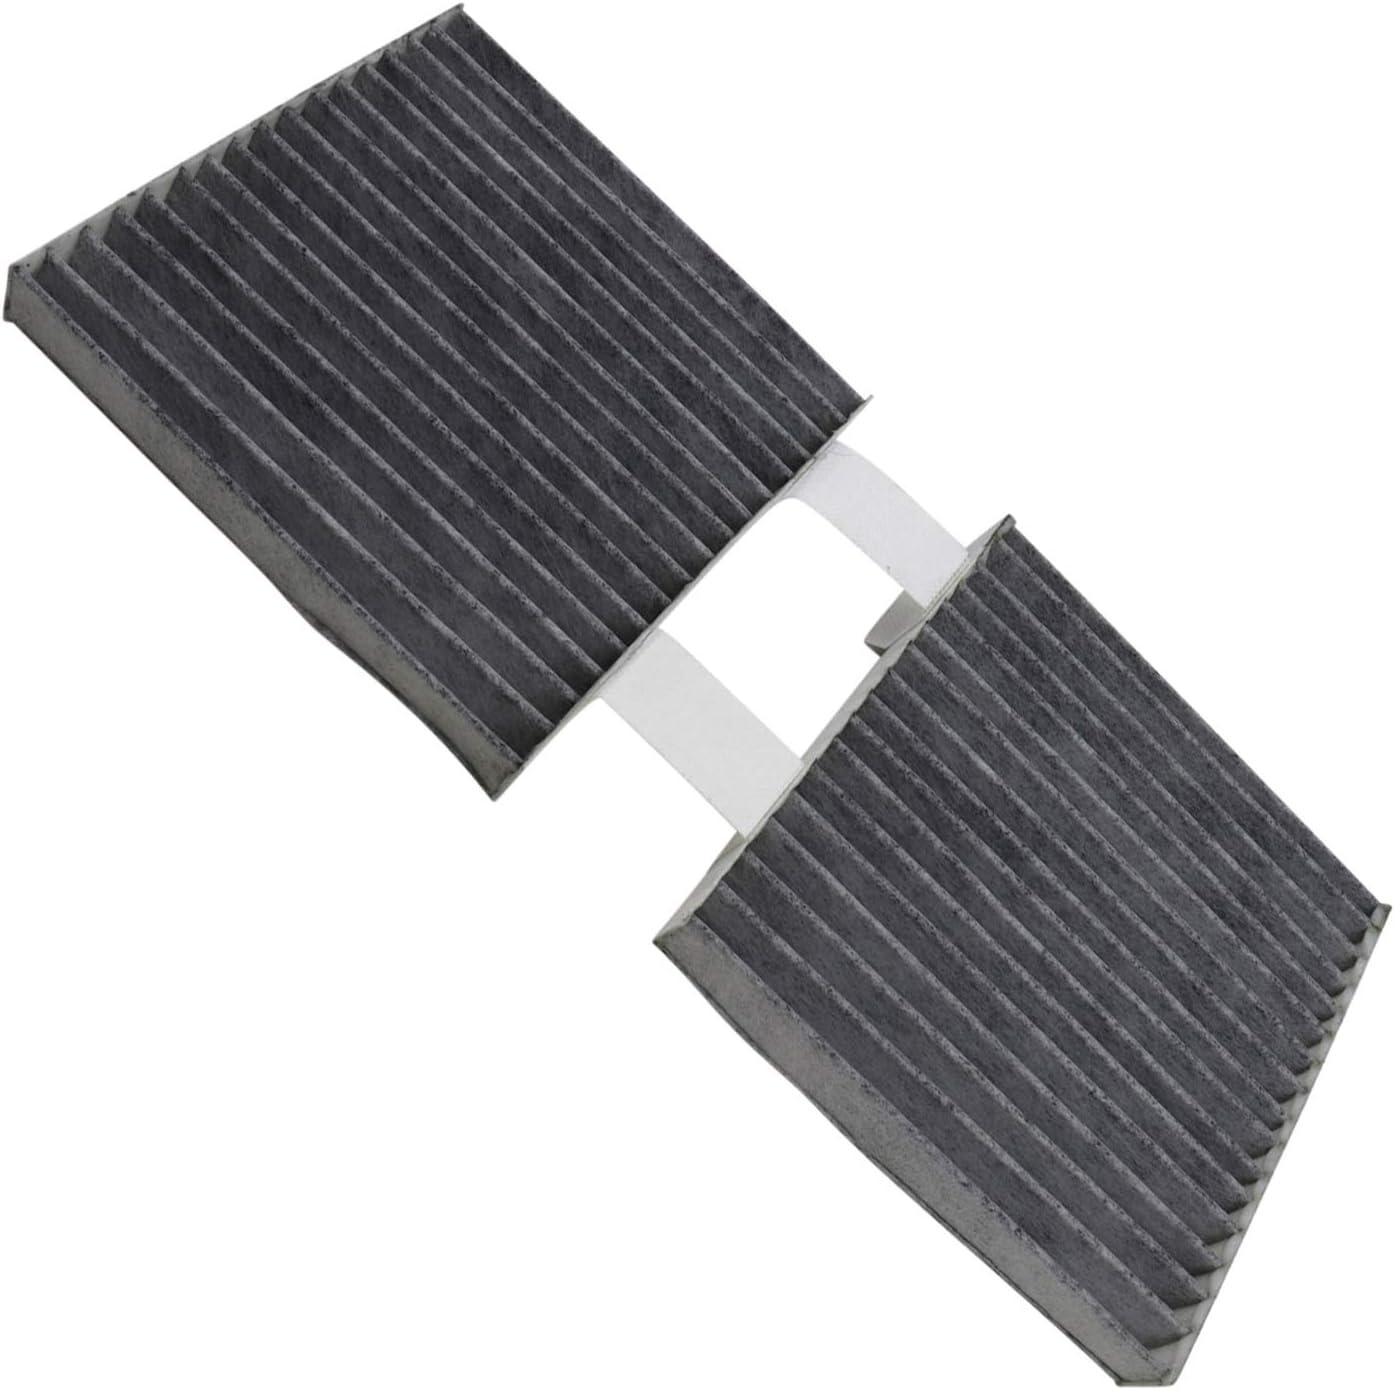 Beck Arnley 042-2193 Cabin Air Filter Pair